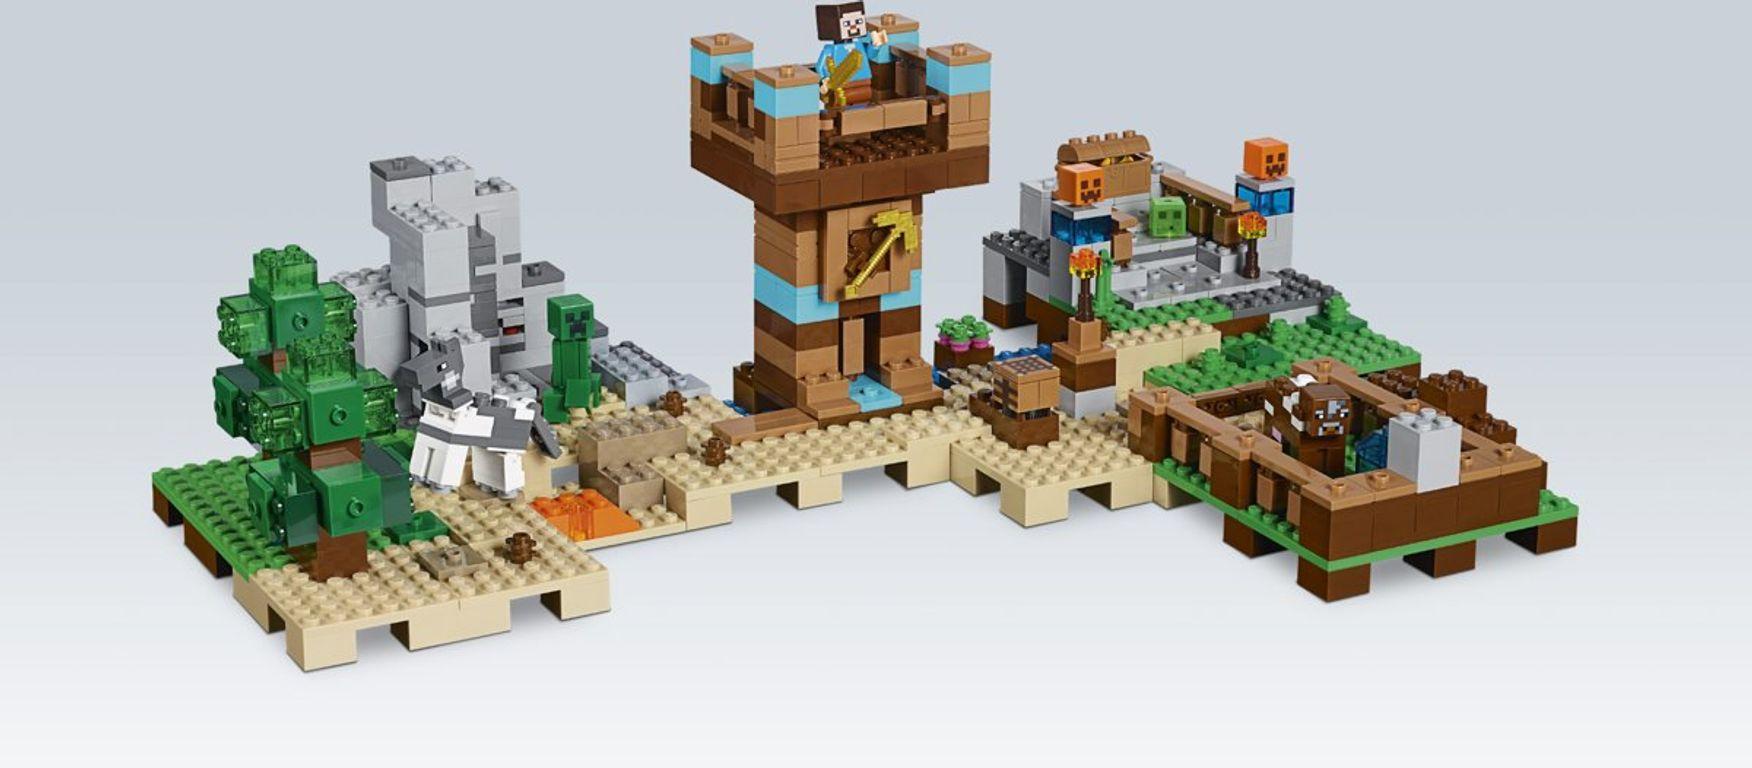 The Crafting Box 2.0 gameplay